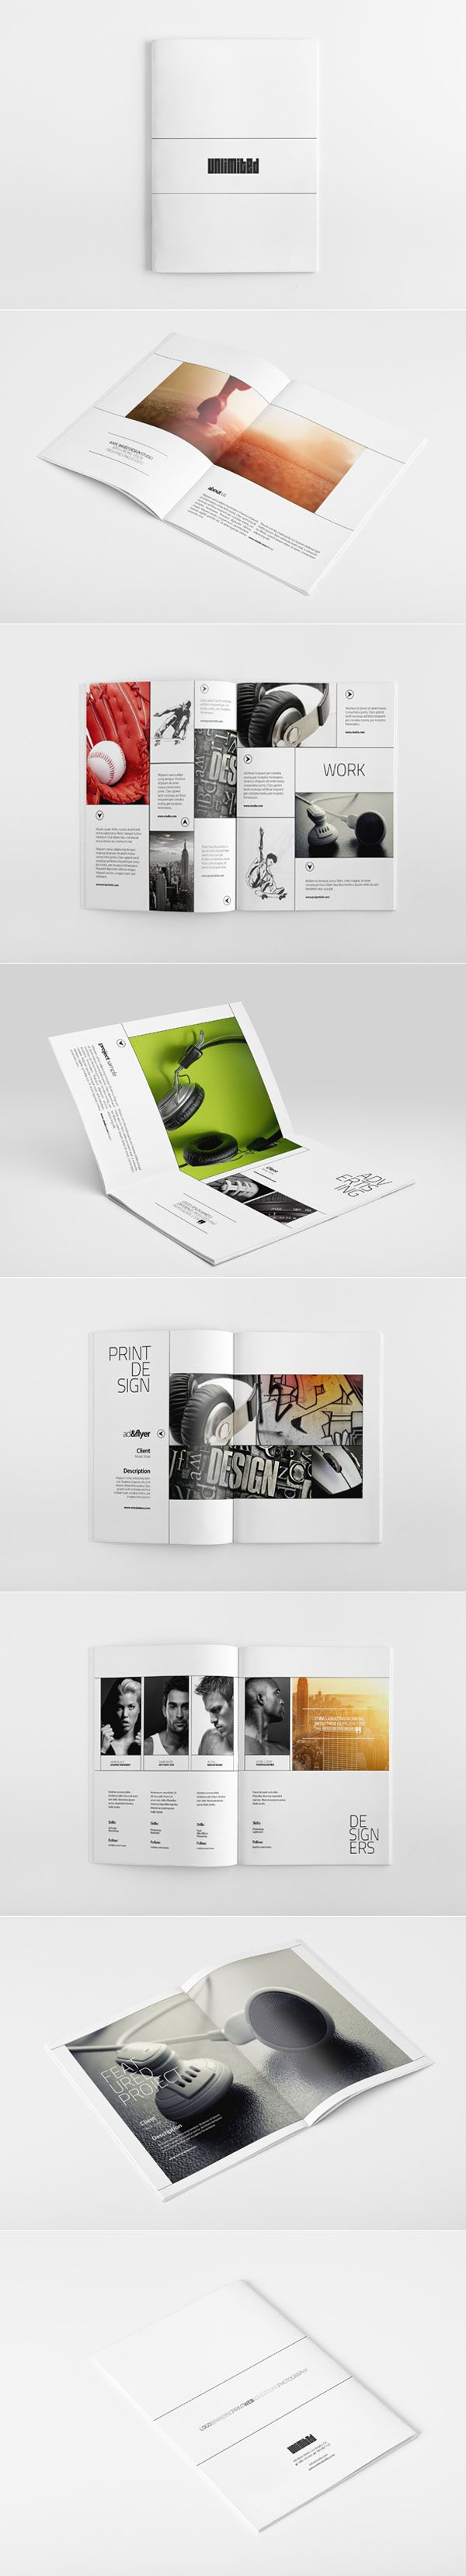 Portfolio brochure design ideas 20+ Simple Yet Beautiful Brochure Design Inspiration & Templates